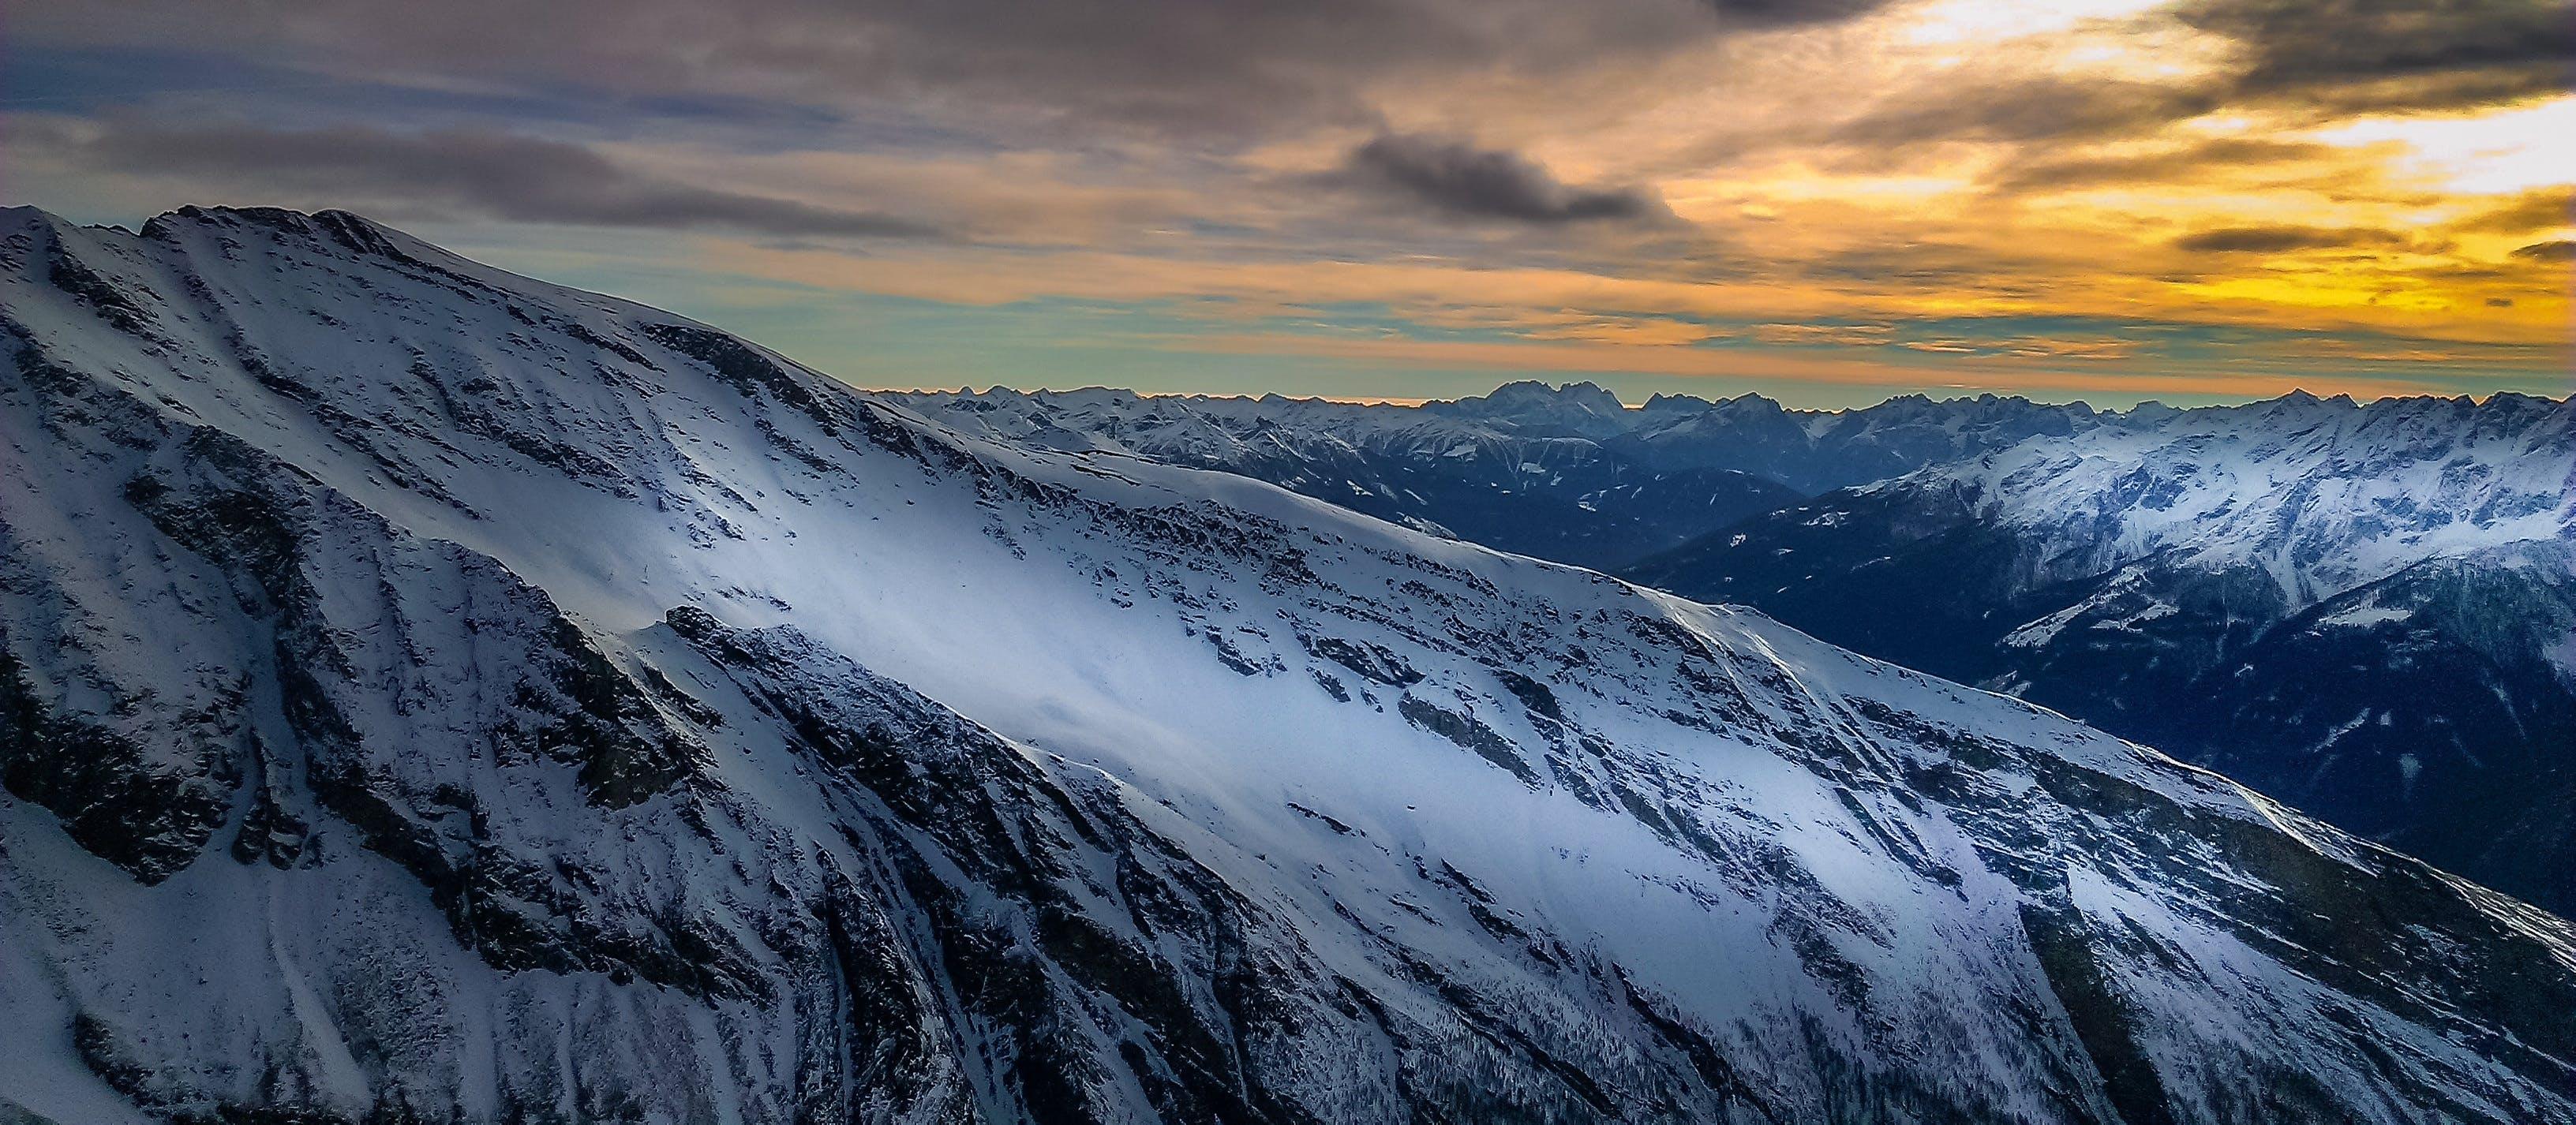 Kostenloses Stock Foto zu alpen, berg, berge, dämmerung